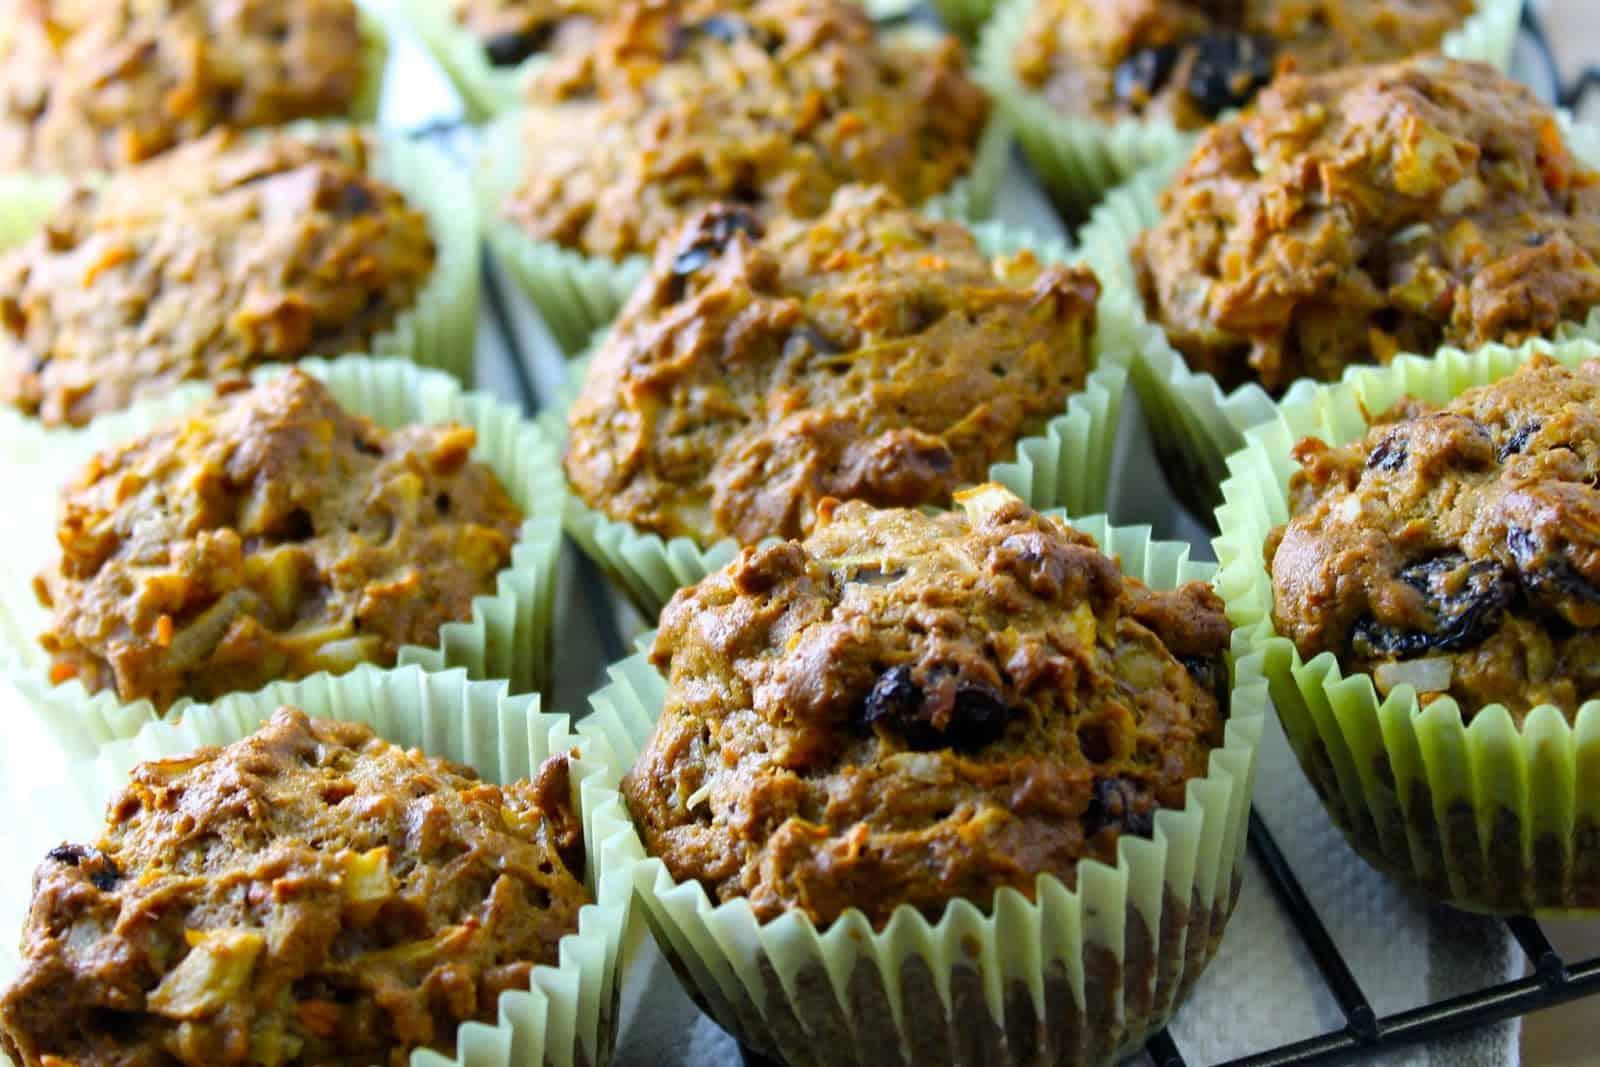 Receta de panecillos o muffins saludables de zanahoria